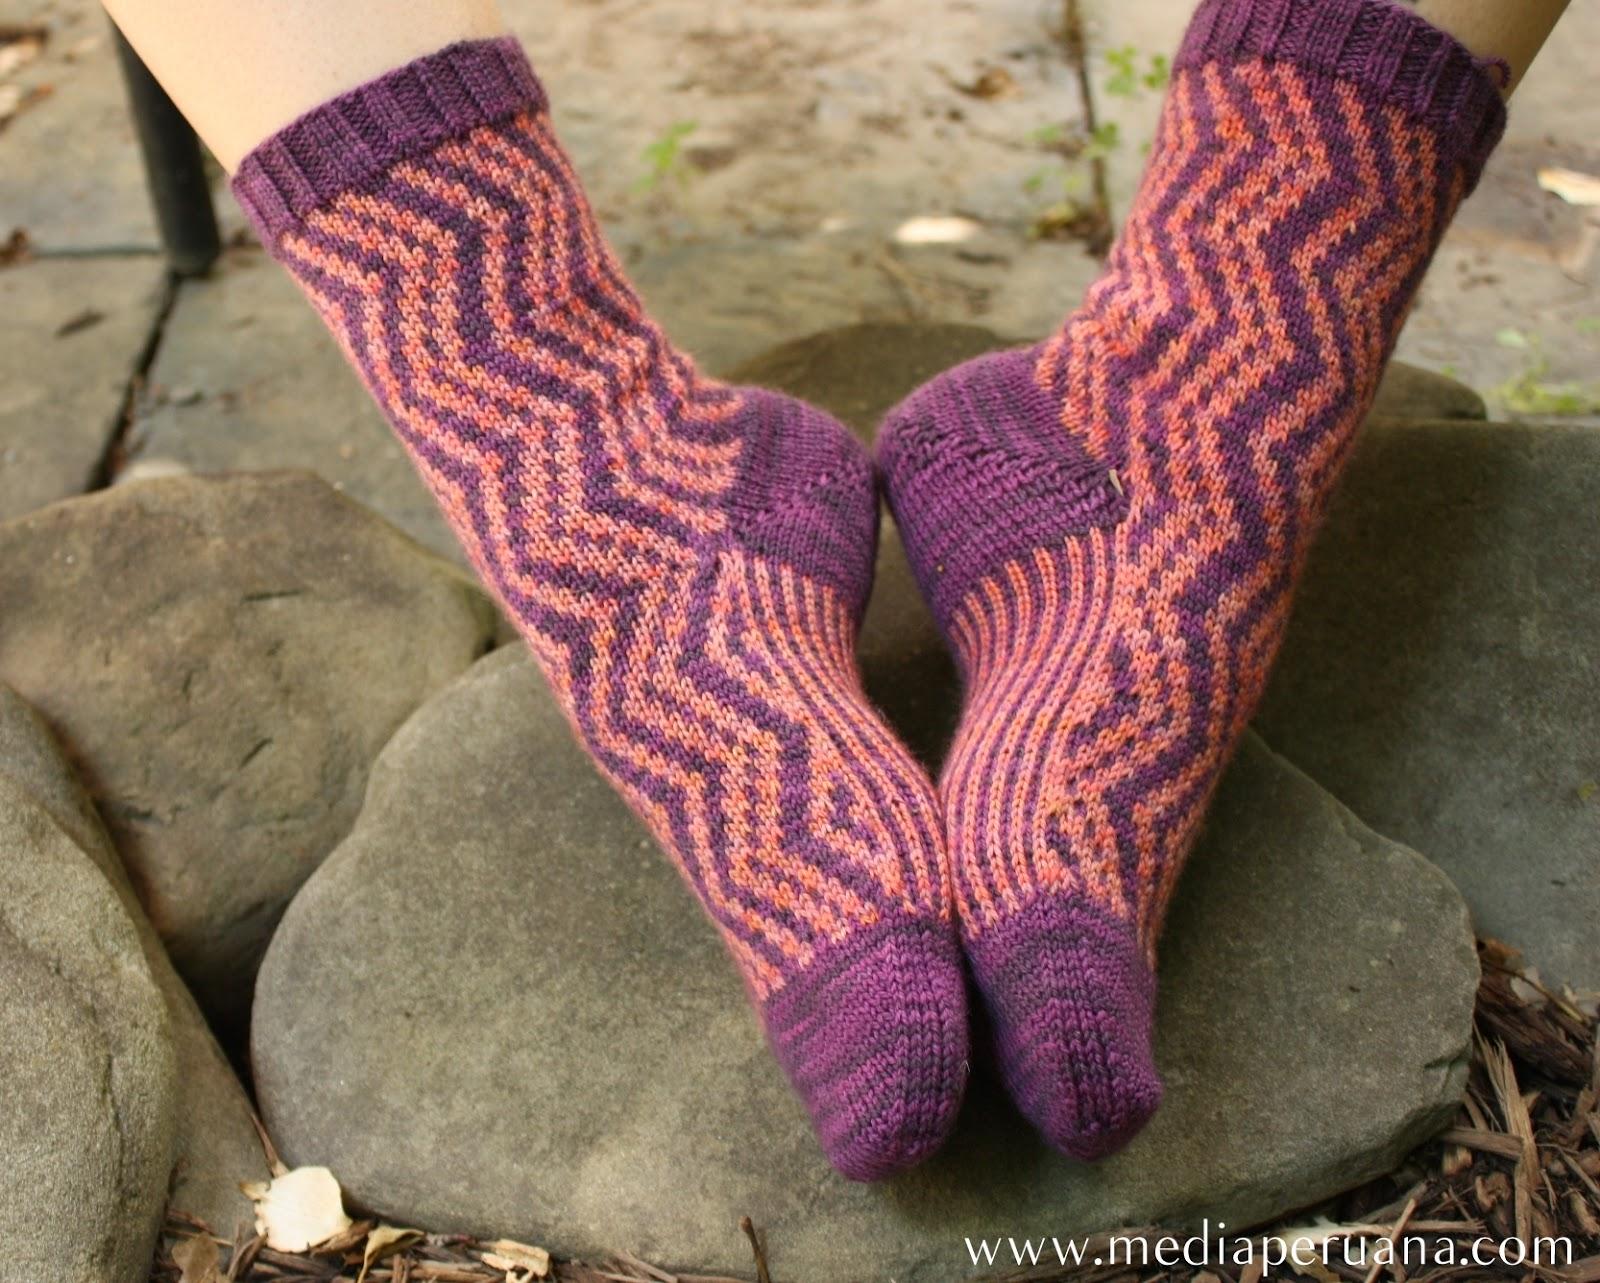 Volteado socks